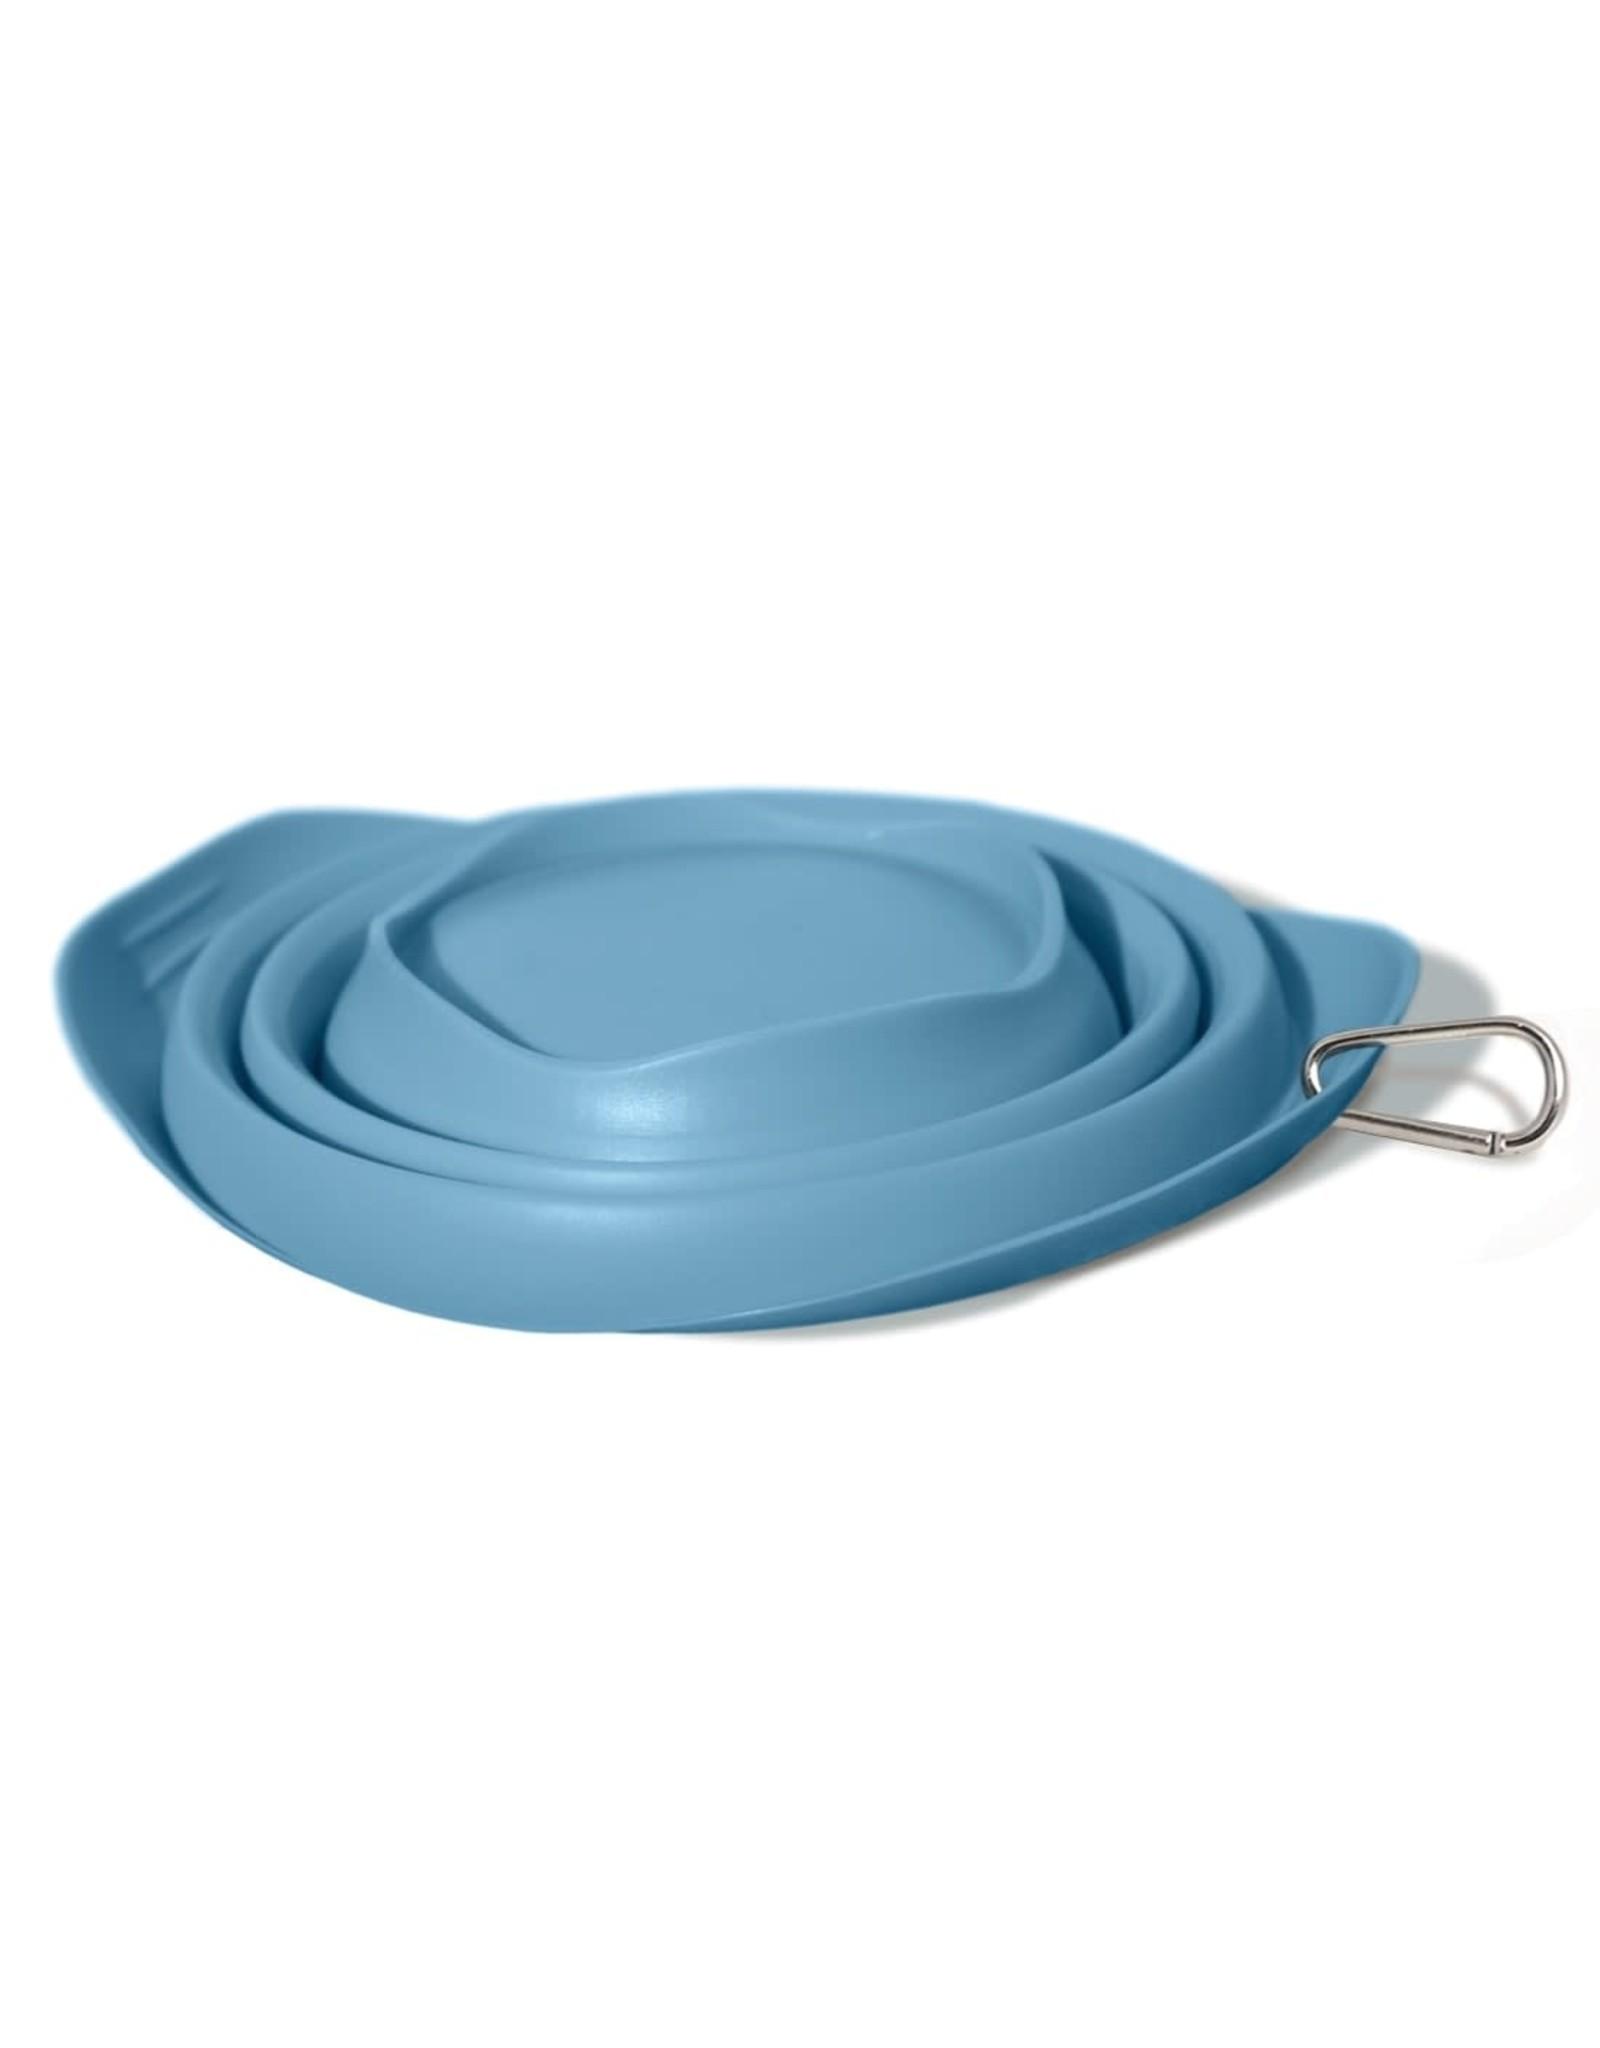 Kurgo Collaps-a-Bowl: Blue, 24 oz